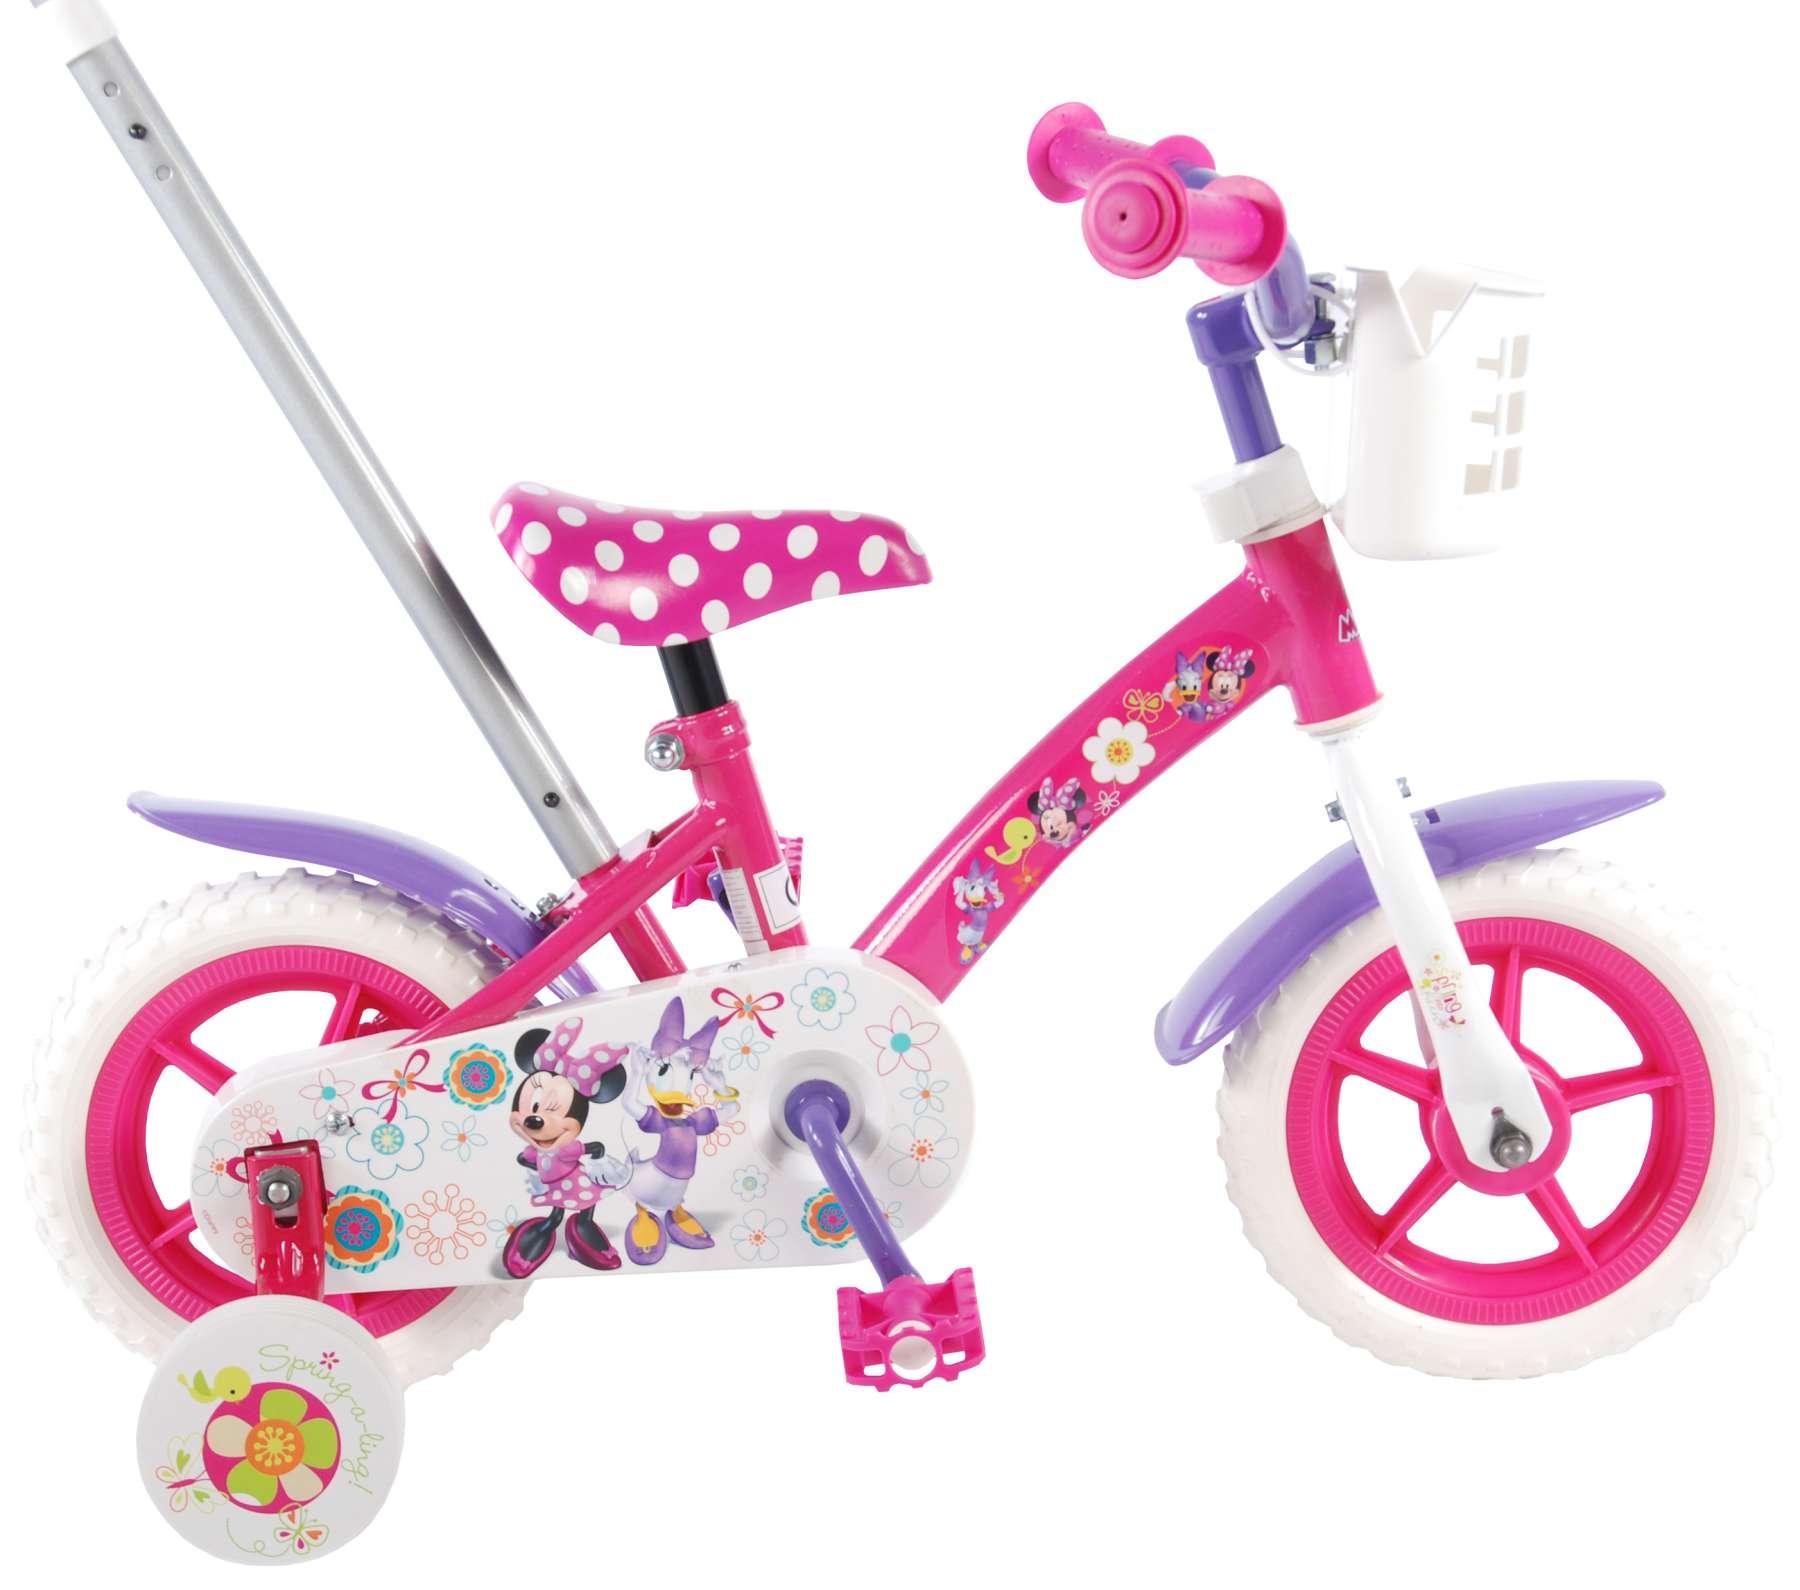 Disney Minnie Mouse Bow-Tique Kinderfahrrad 10 Zoll